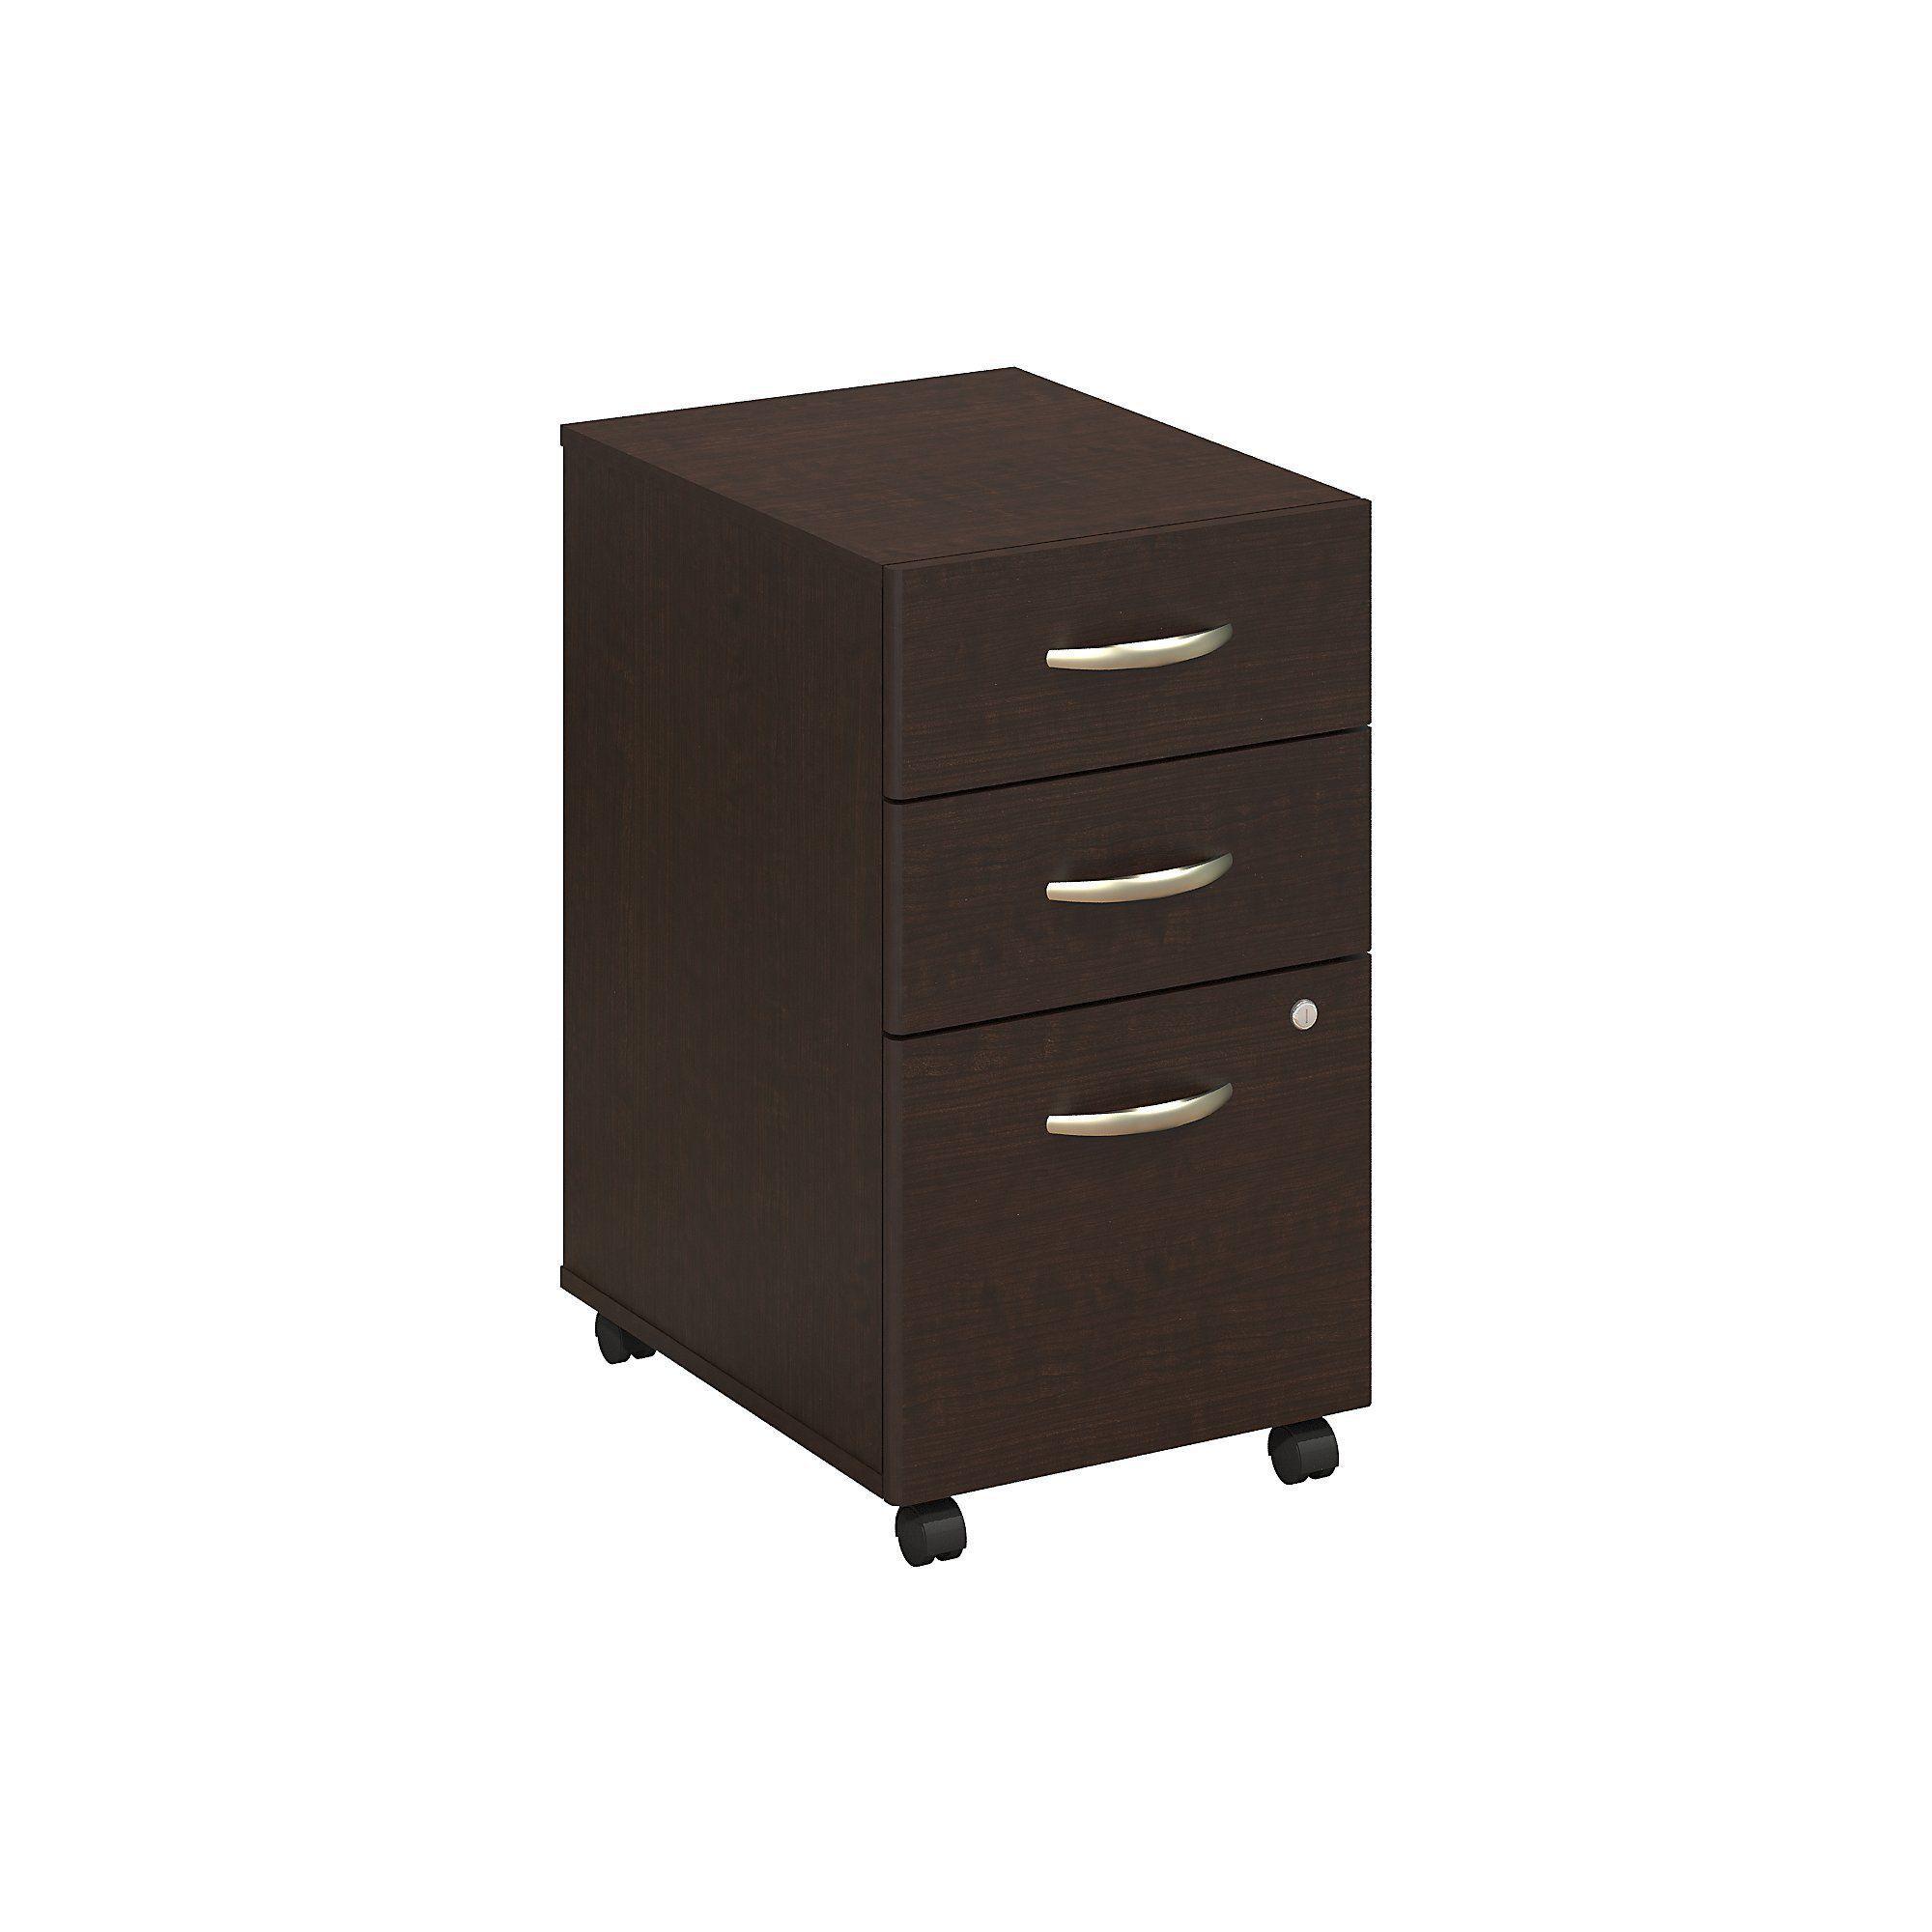 Cherry File Cabinets Bush Business Furniture Series C Mocha Cherry 3 Drawer Mobile